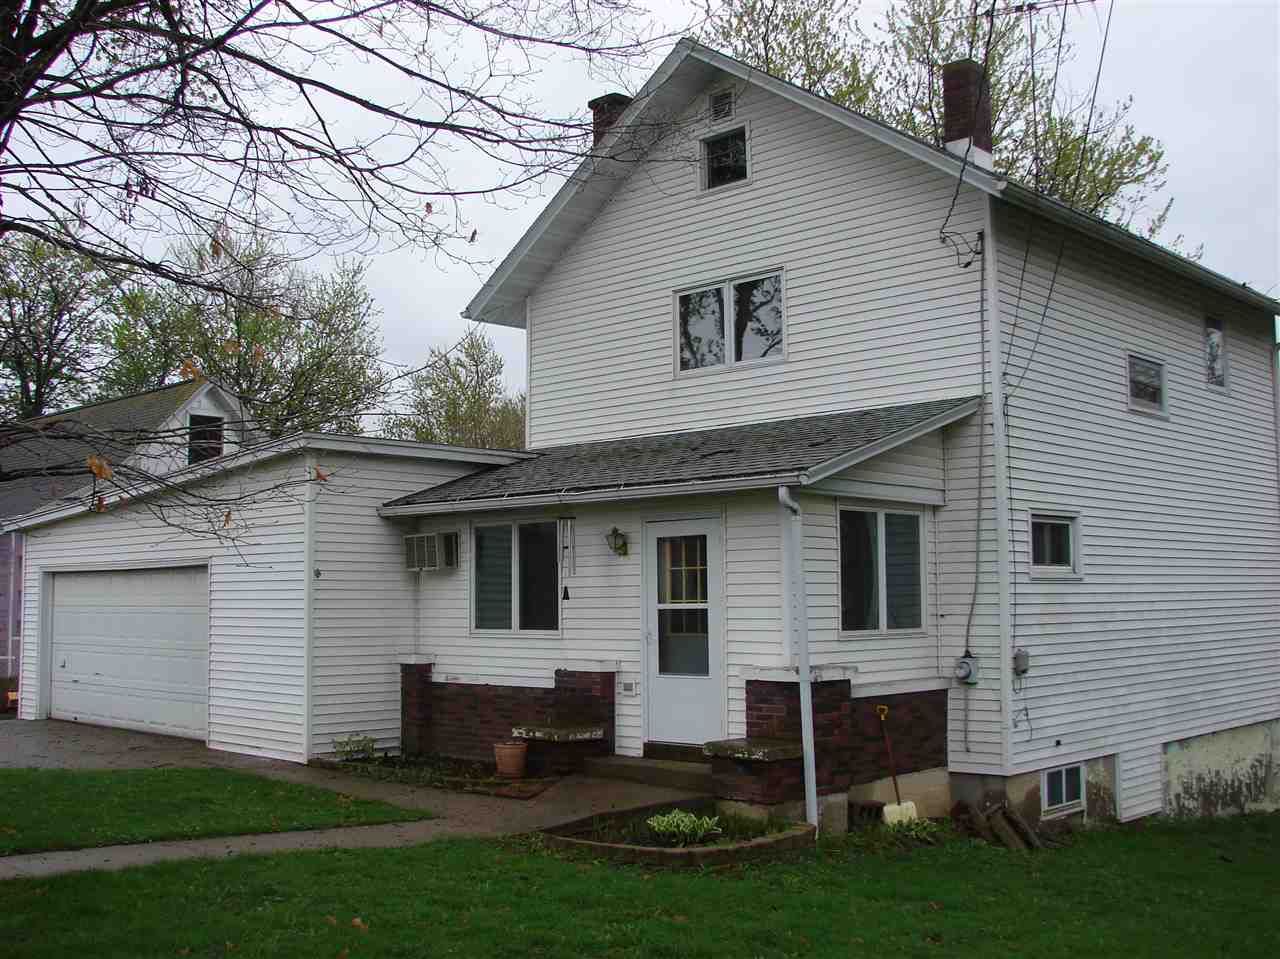 429 Wisconsin ST, Linden, WI 53553